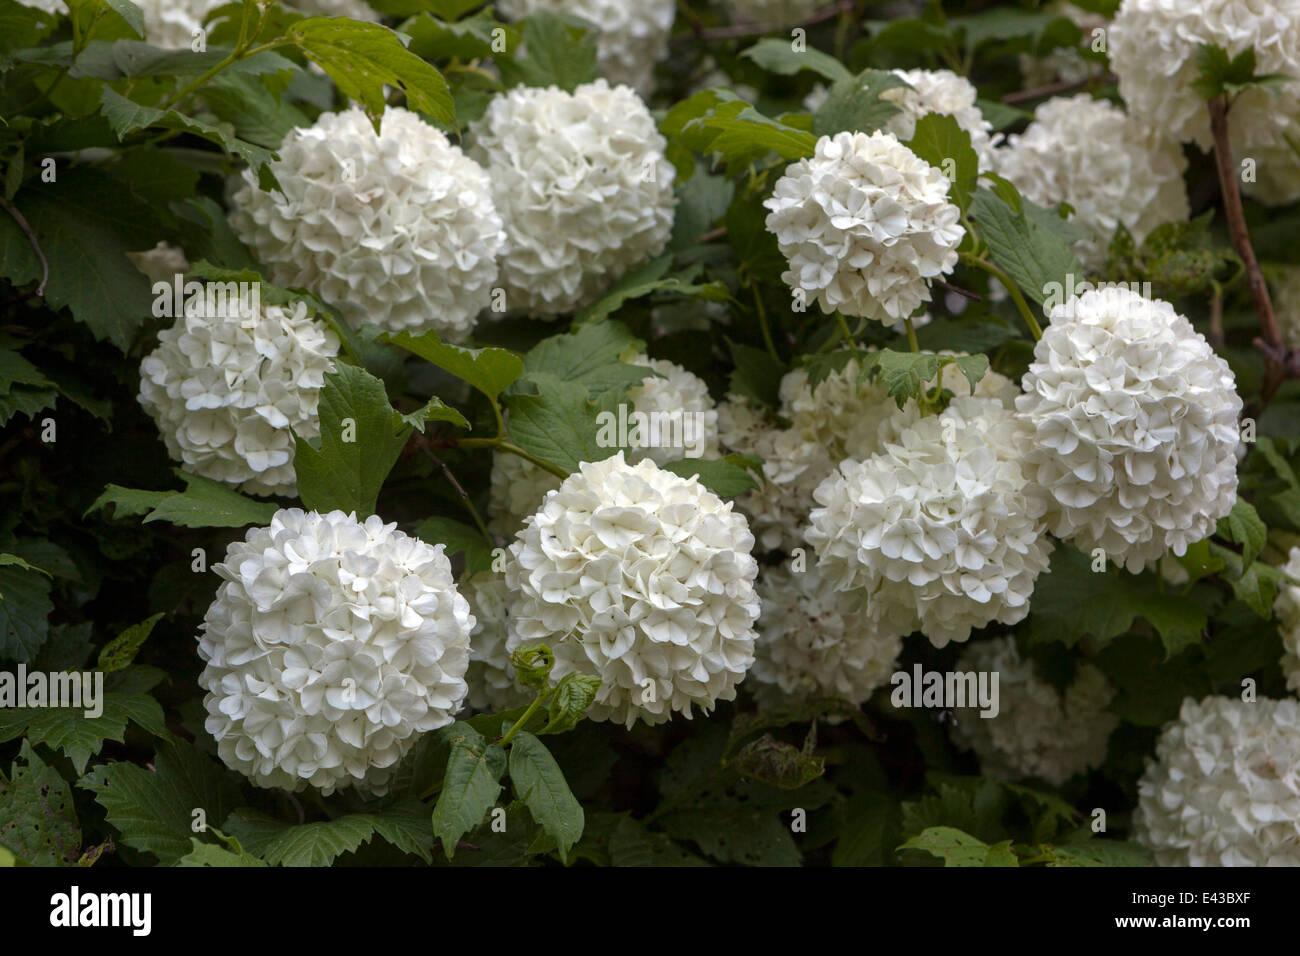 Viburnum opulus (common name guelder rose, water elder, cramp bark, snowball tree and European cranberry bush) - Stock Image